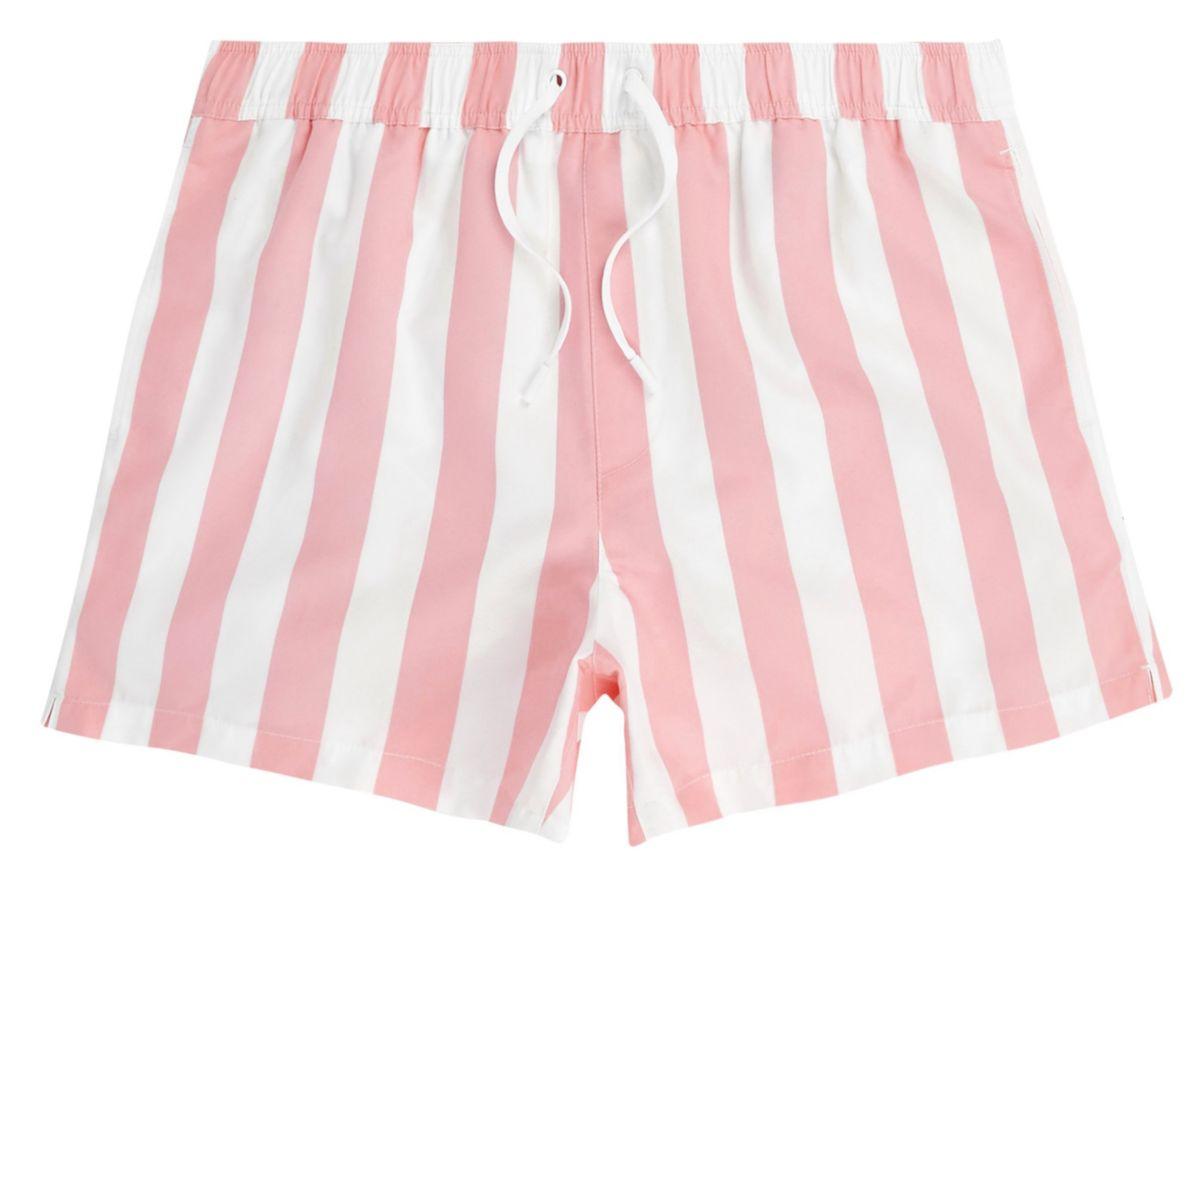 Pink stripe swim trunks